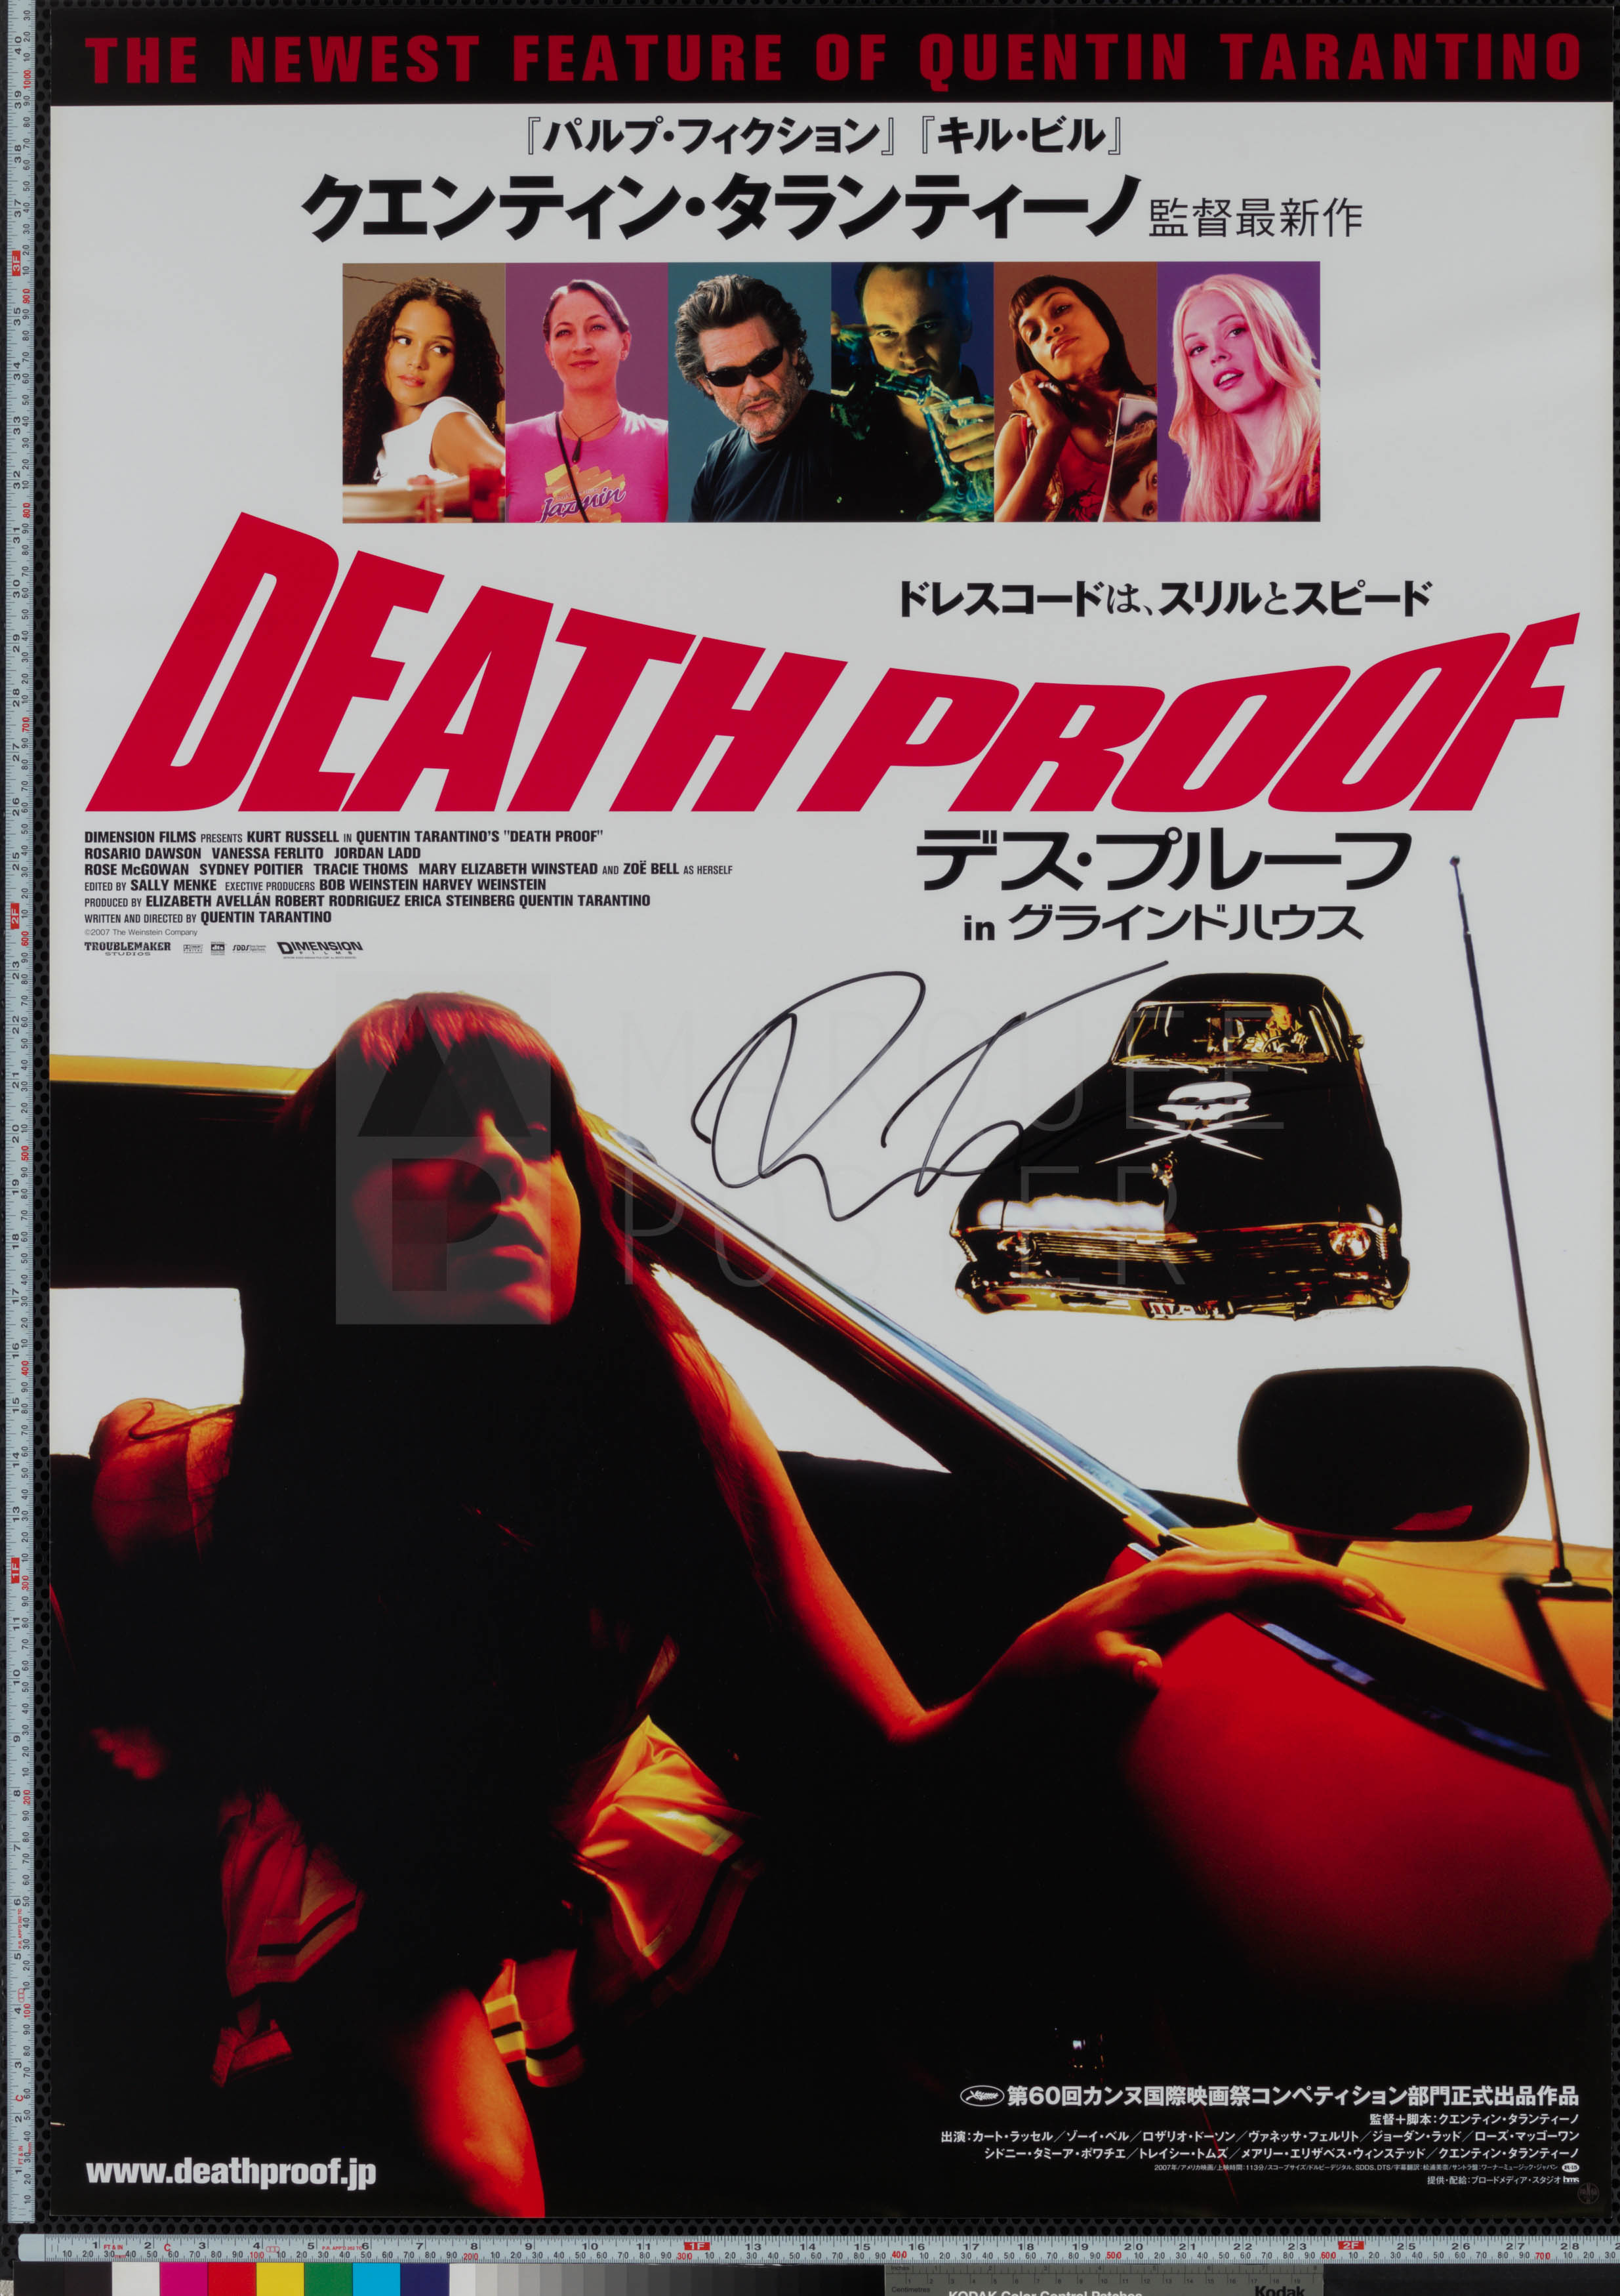 13-death-proof-japanese-b1-2007-02